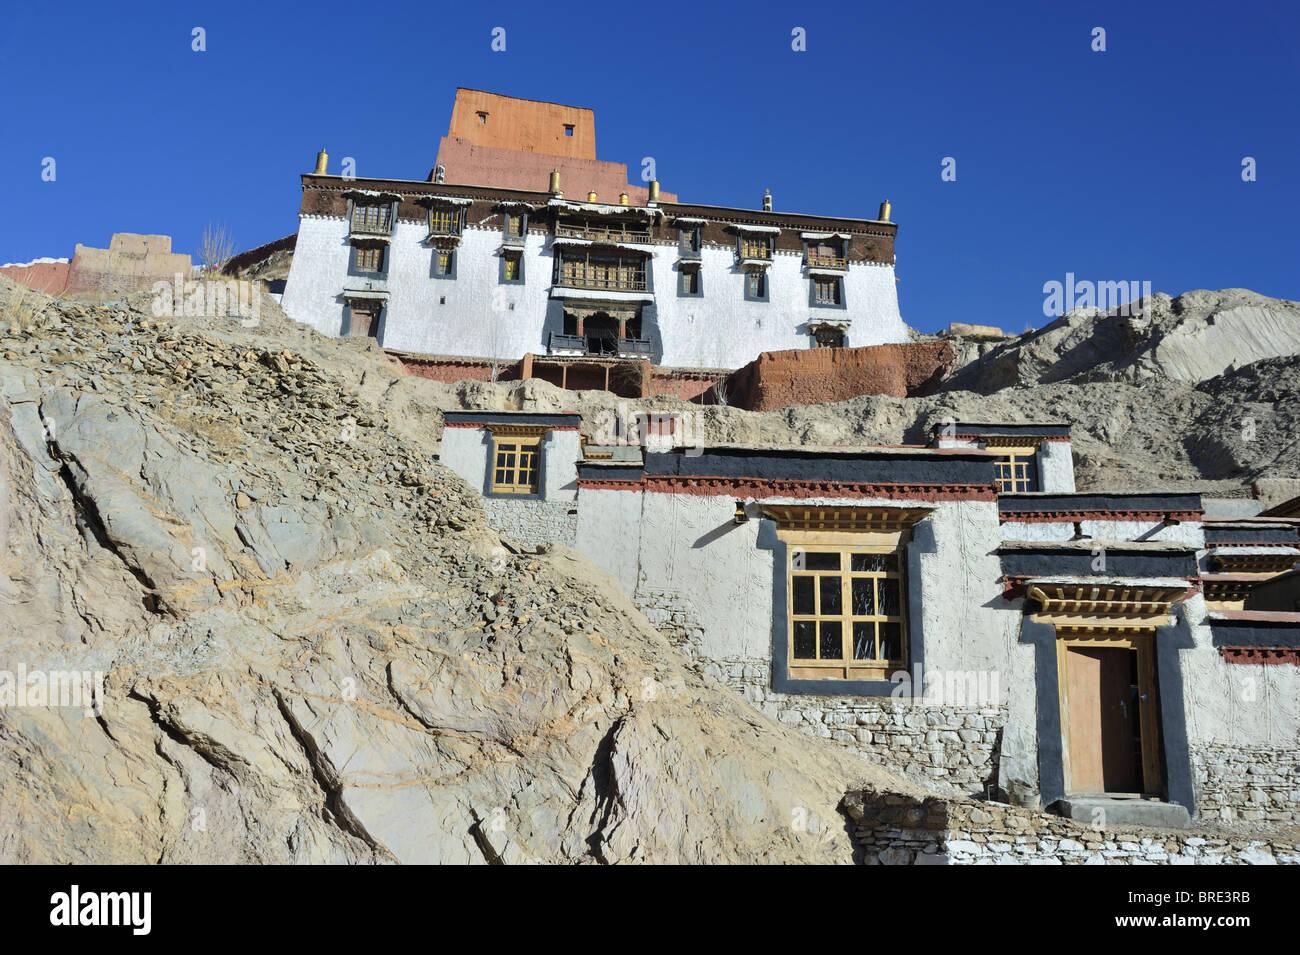 Monks Quarters Palcho Monastery, Gyantse, Tibet. Stock Photo